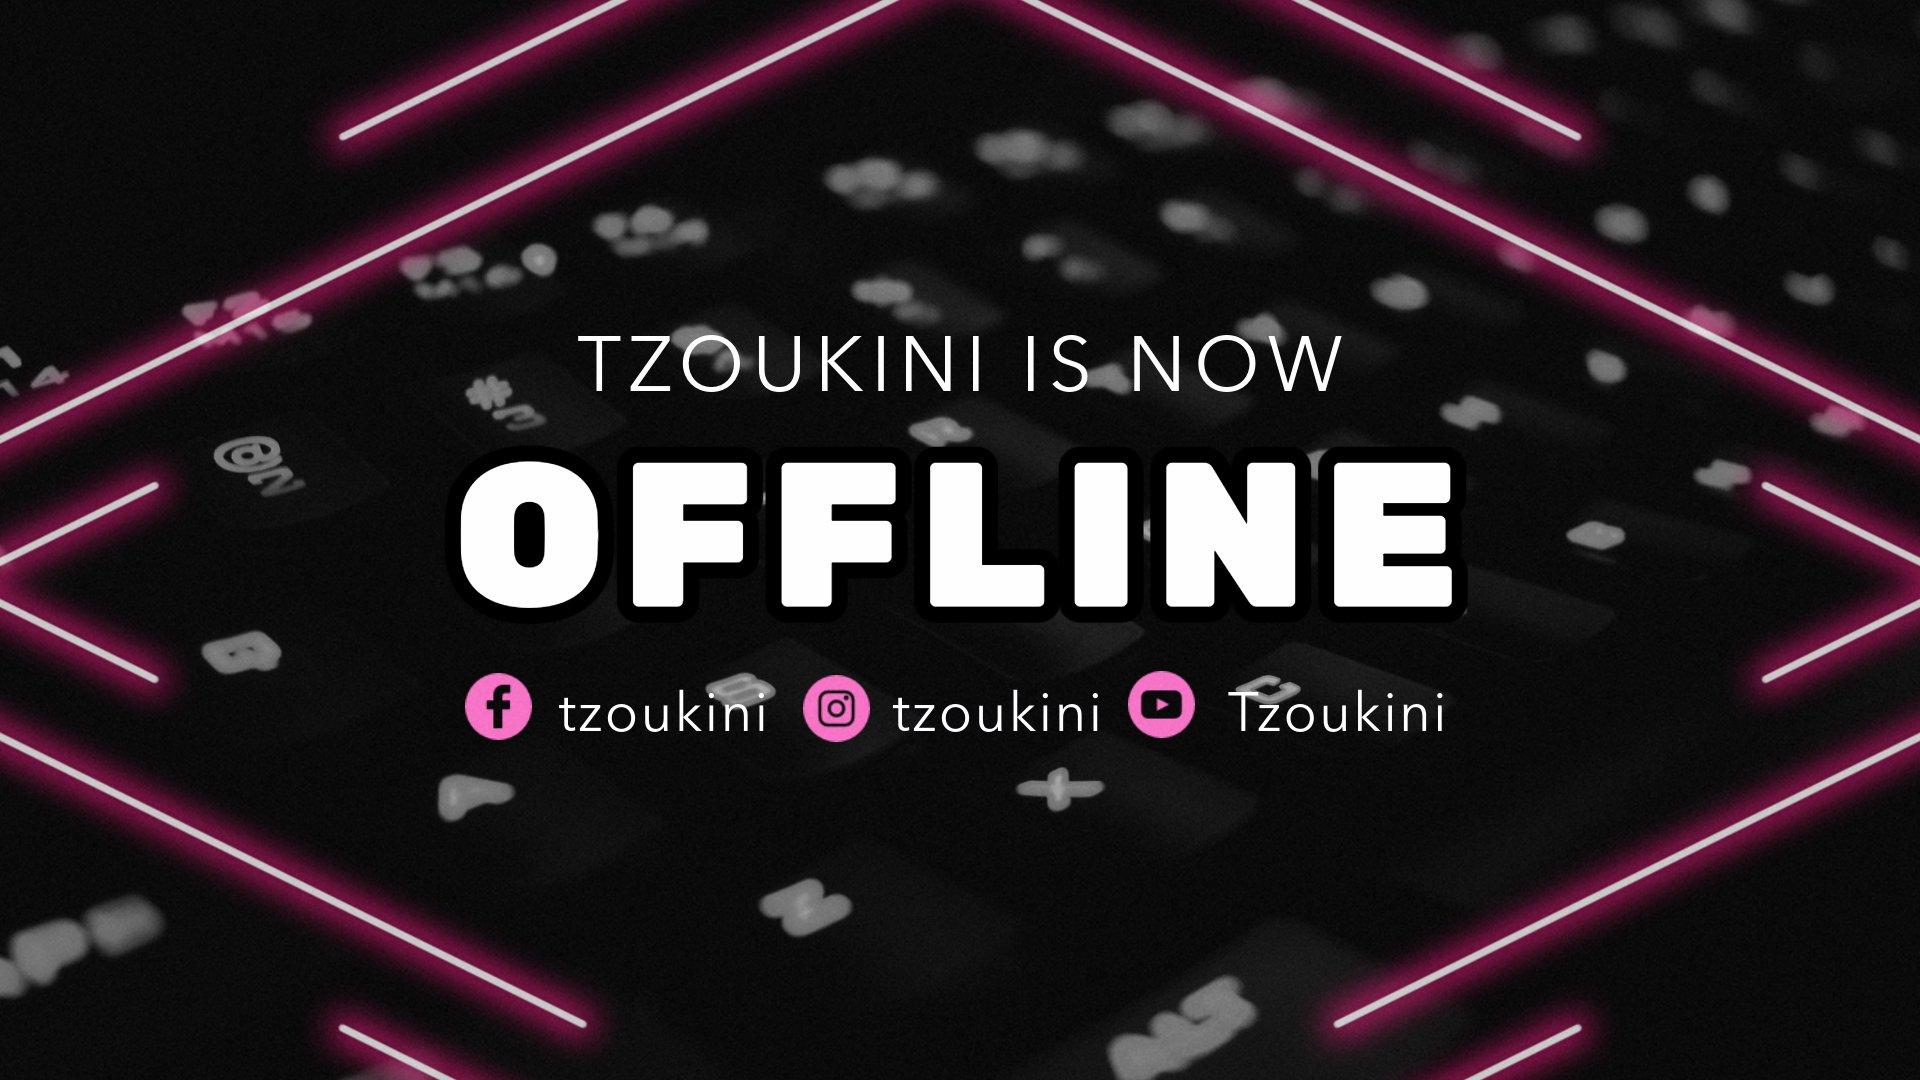 Twitch stream of tzoukini